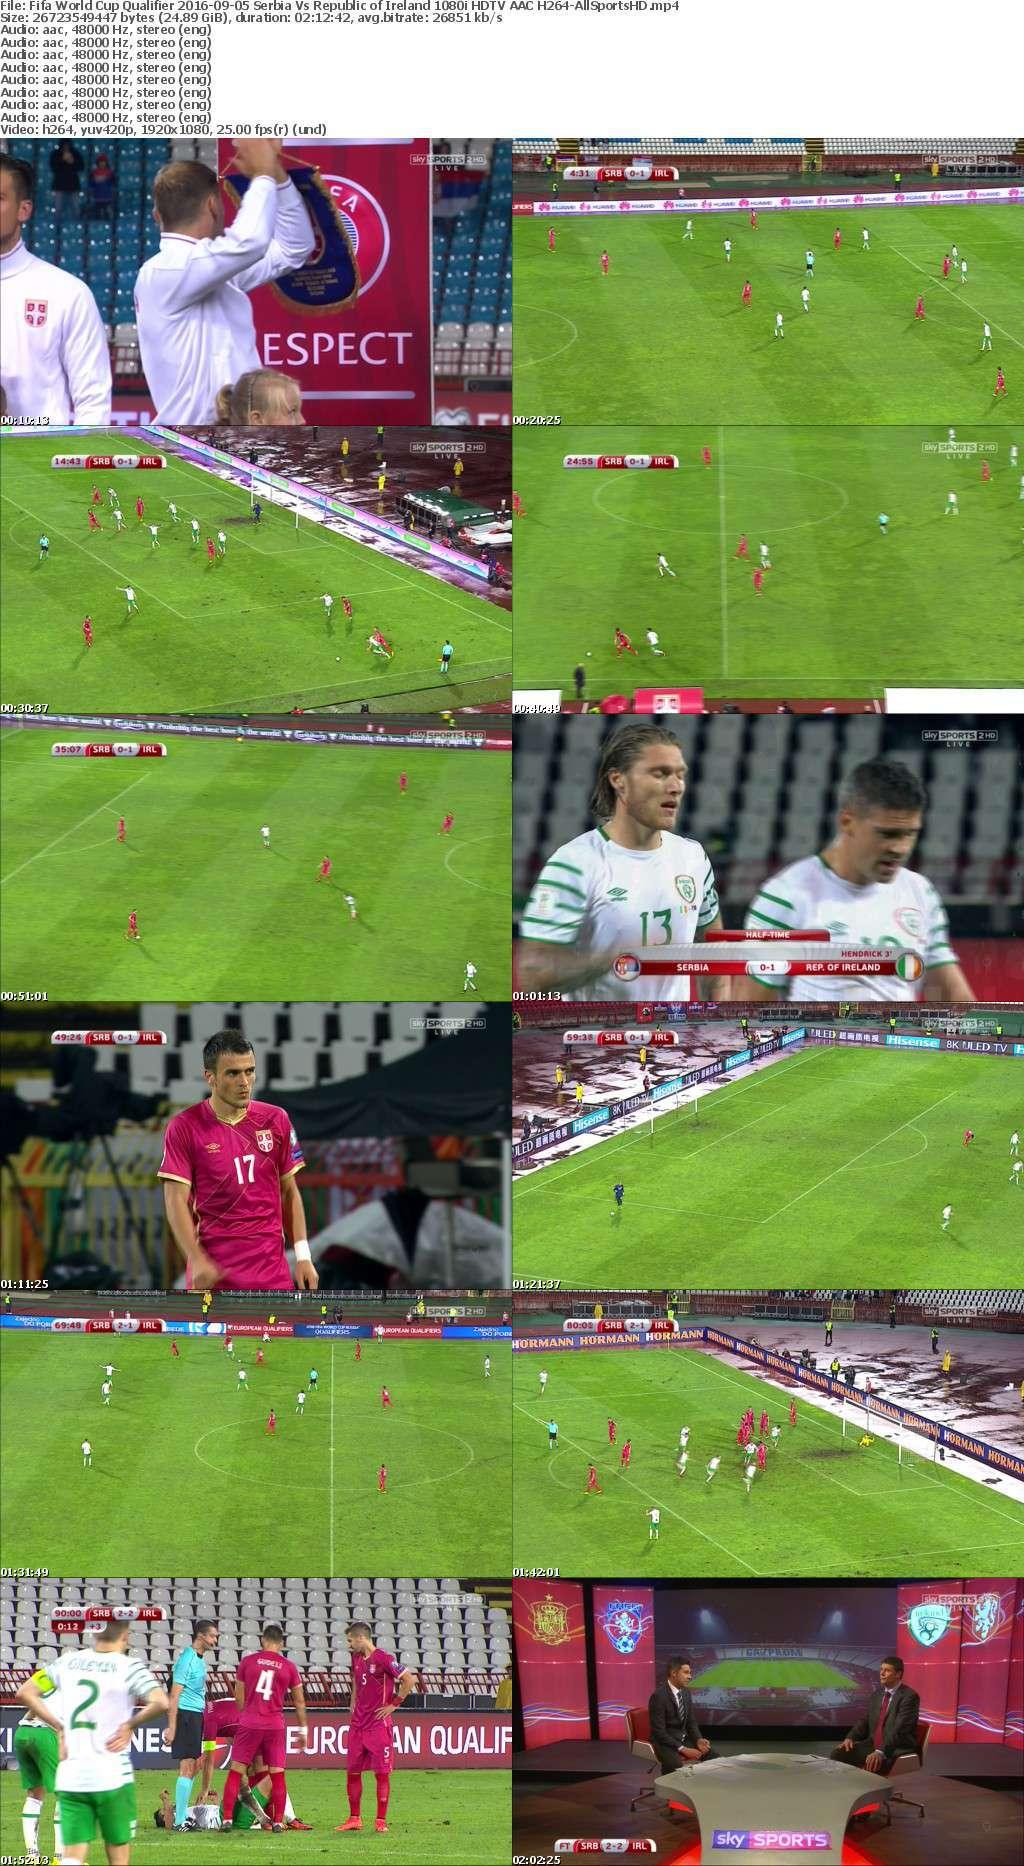 Fifa World Cup Qualifier 2016-09-05 Serbia Vs Republic of Ireland 1080i HDTV AAC H264-AllSportsHD